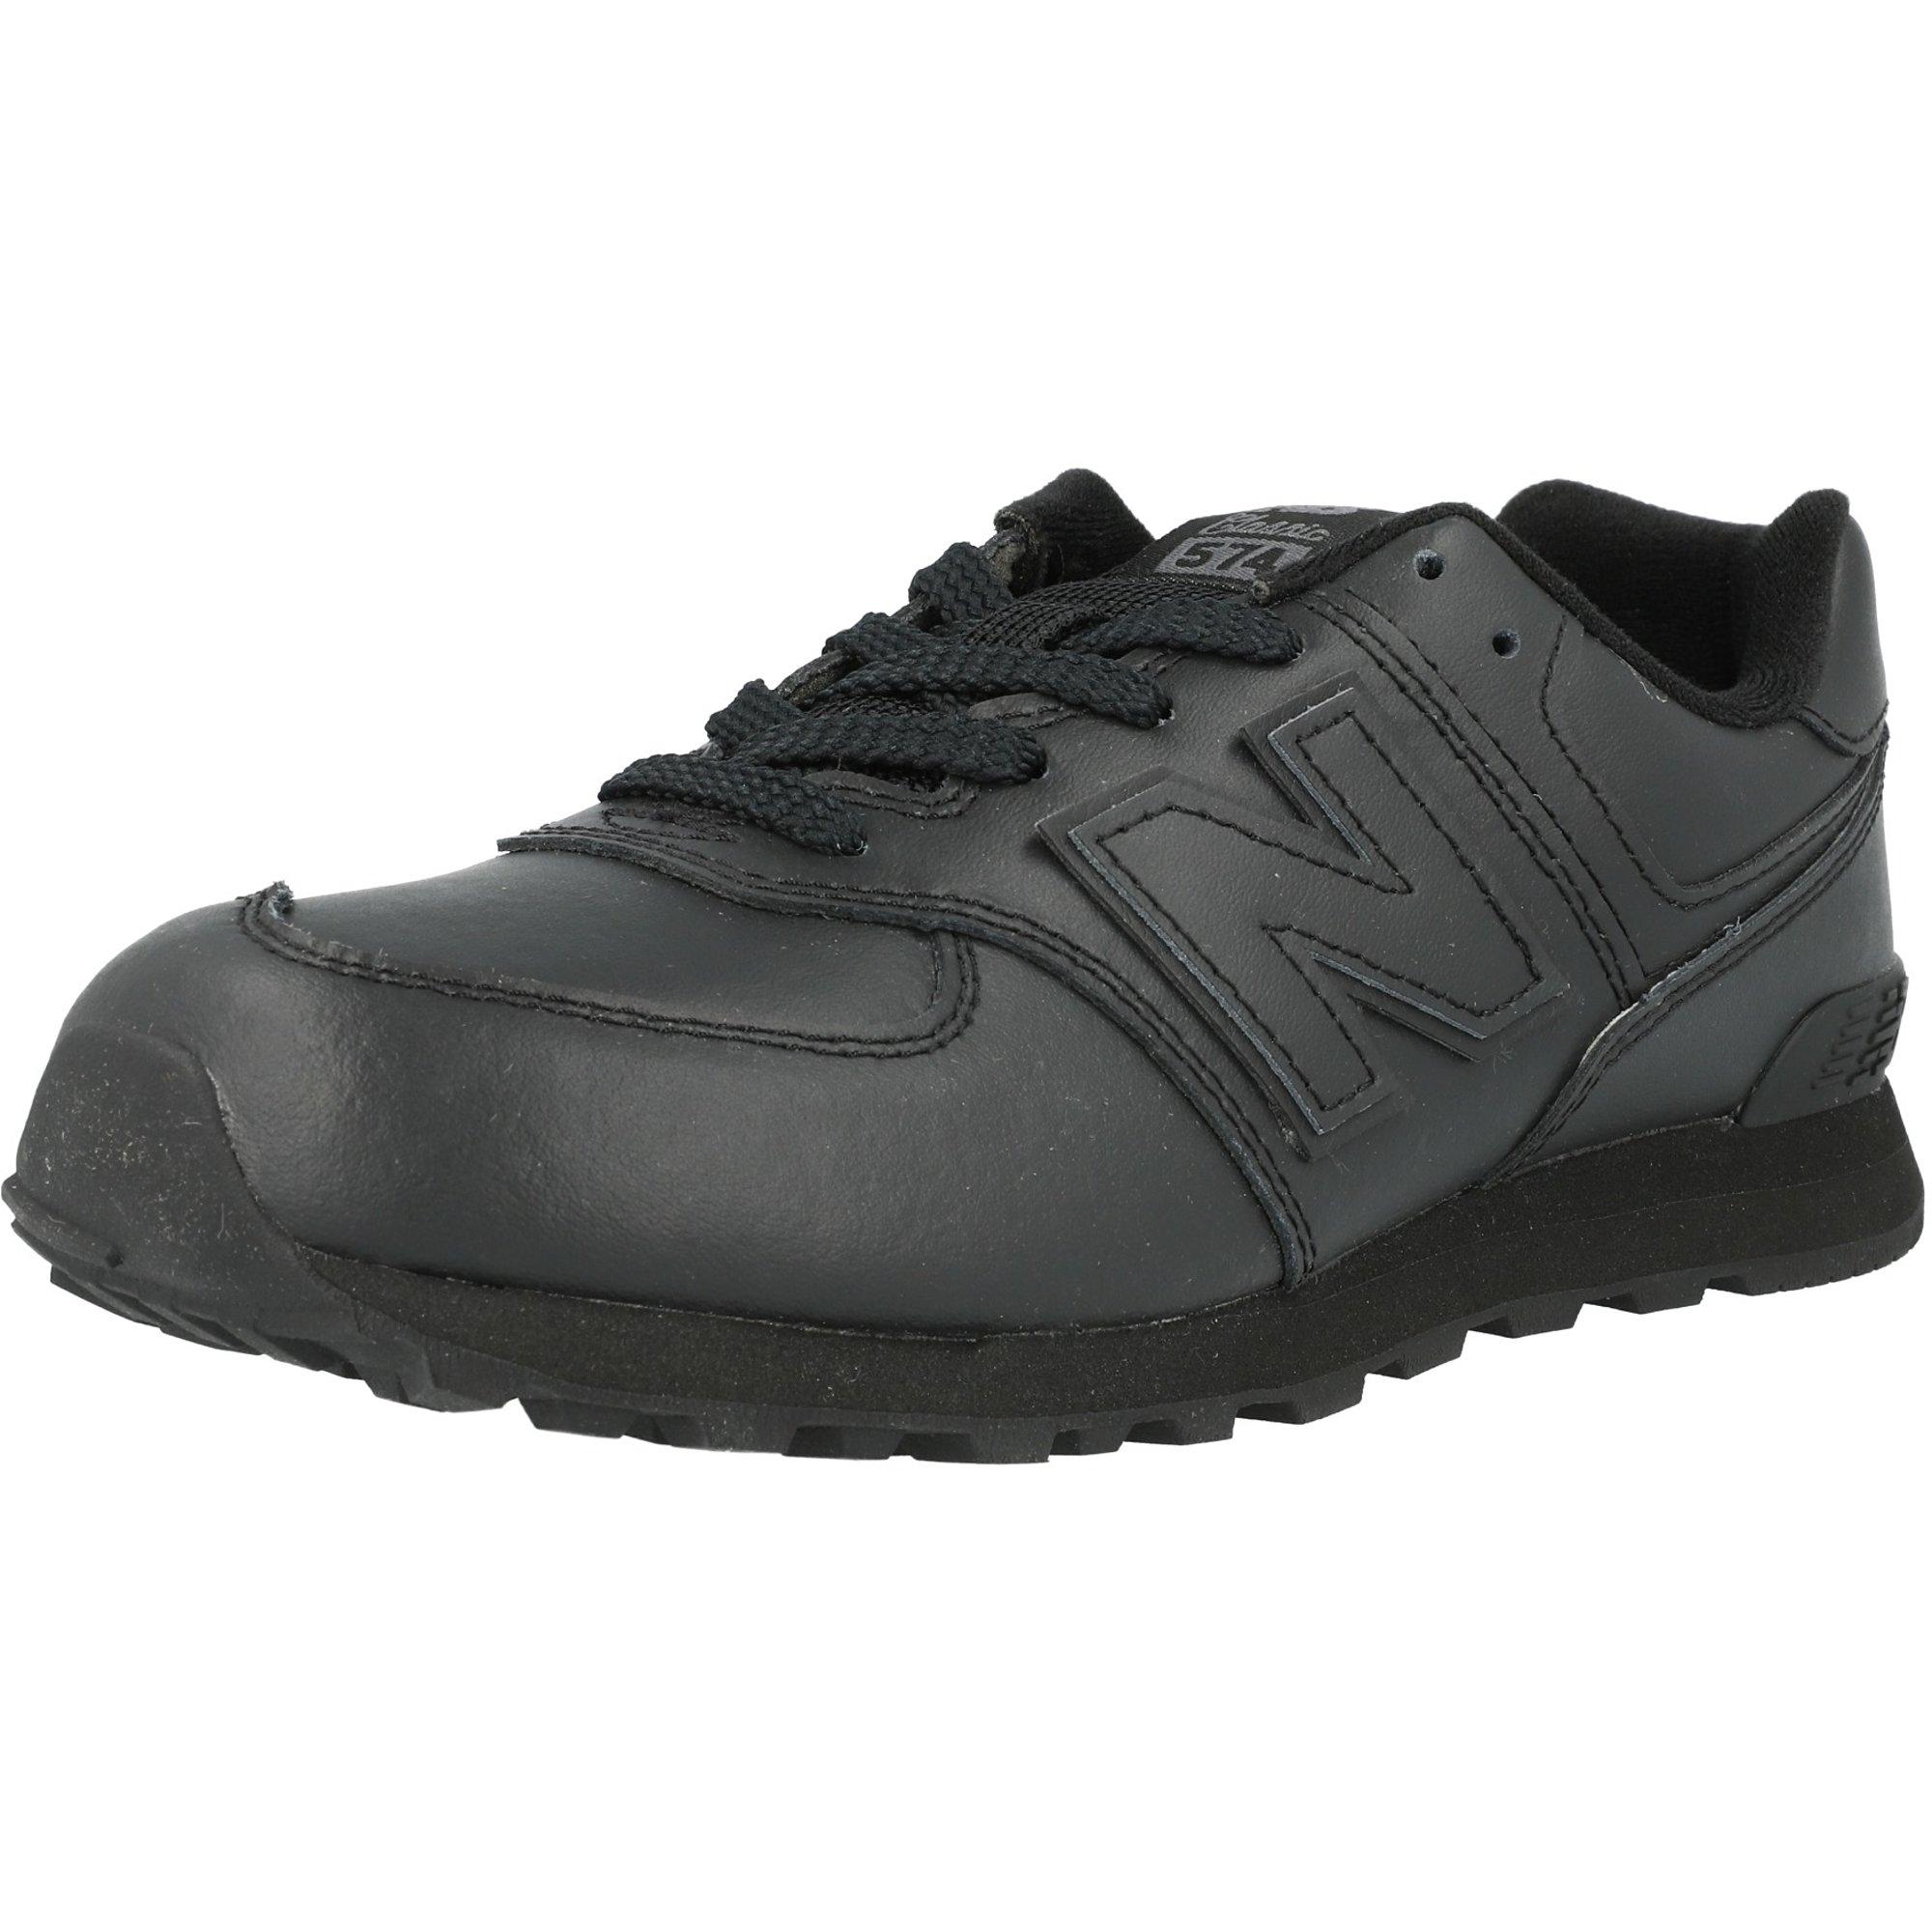 New Balance 574 Black Leather